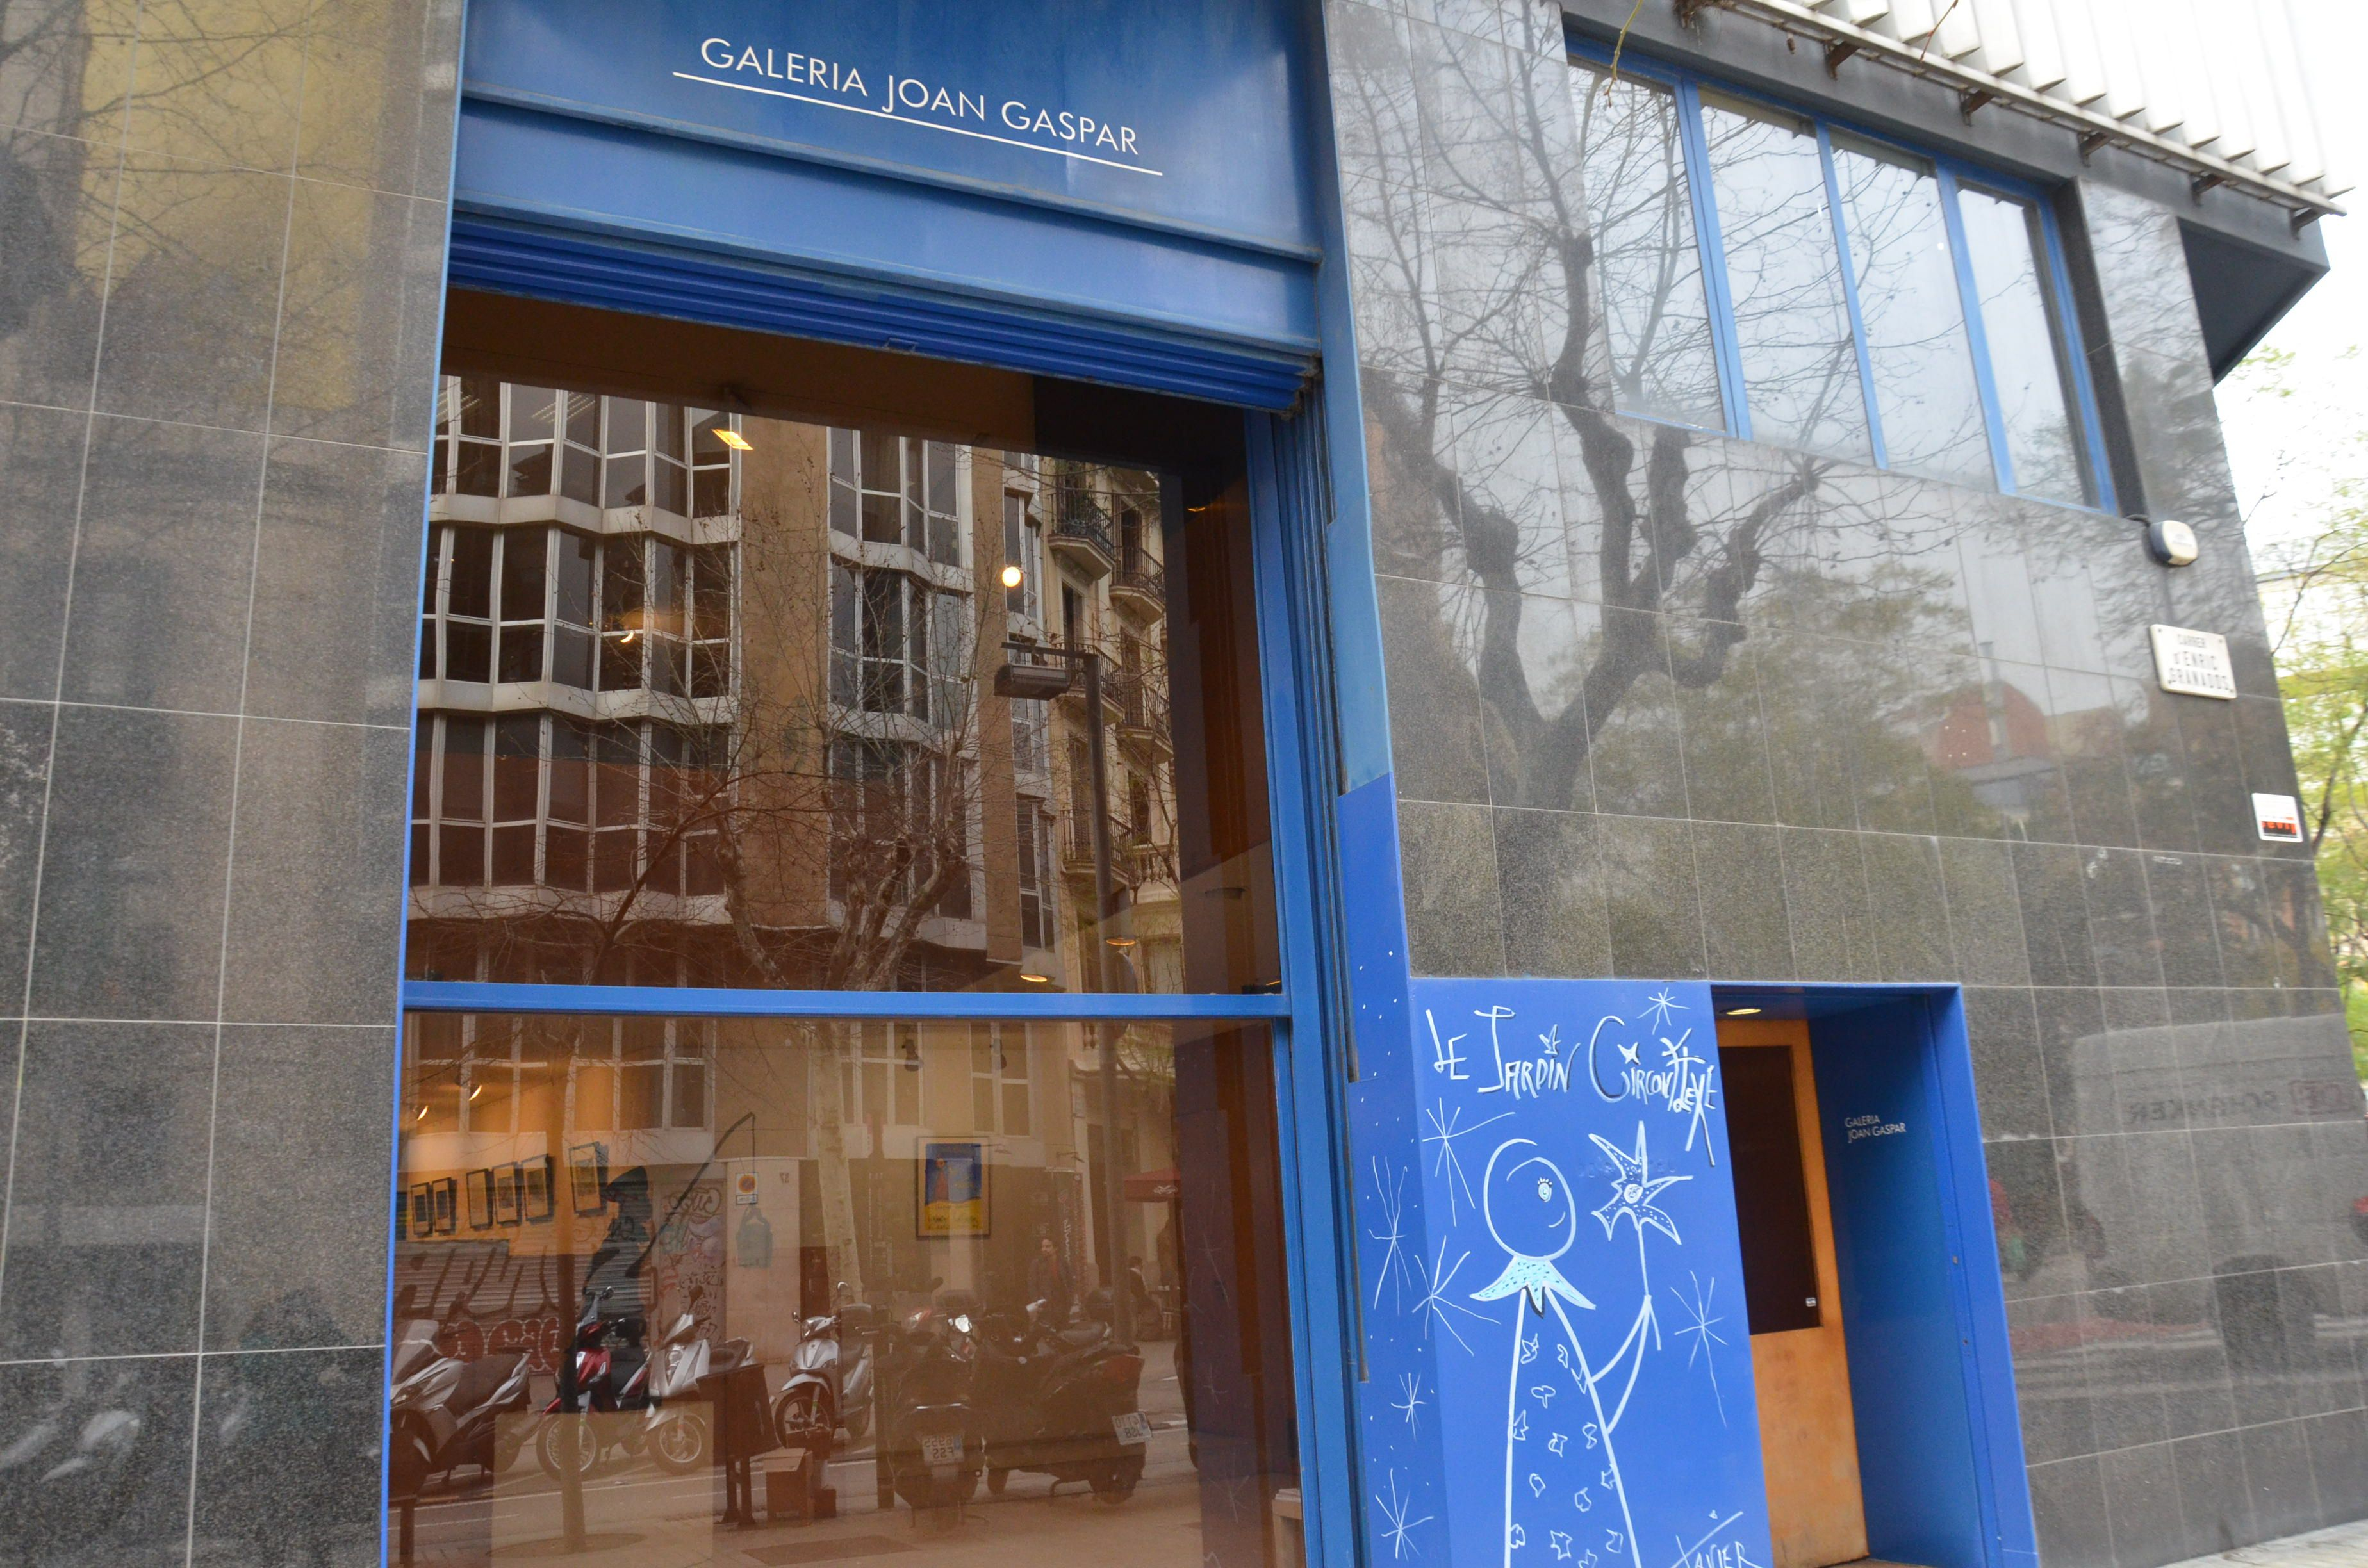 Galería Joan Gaspar, Barcelona: All year